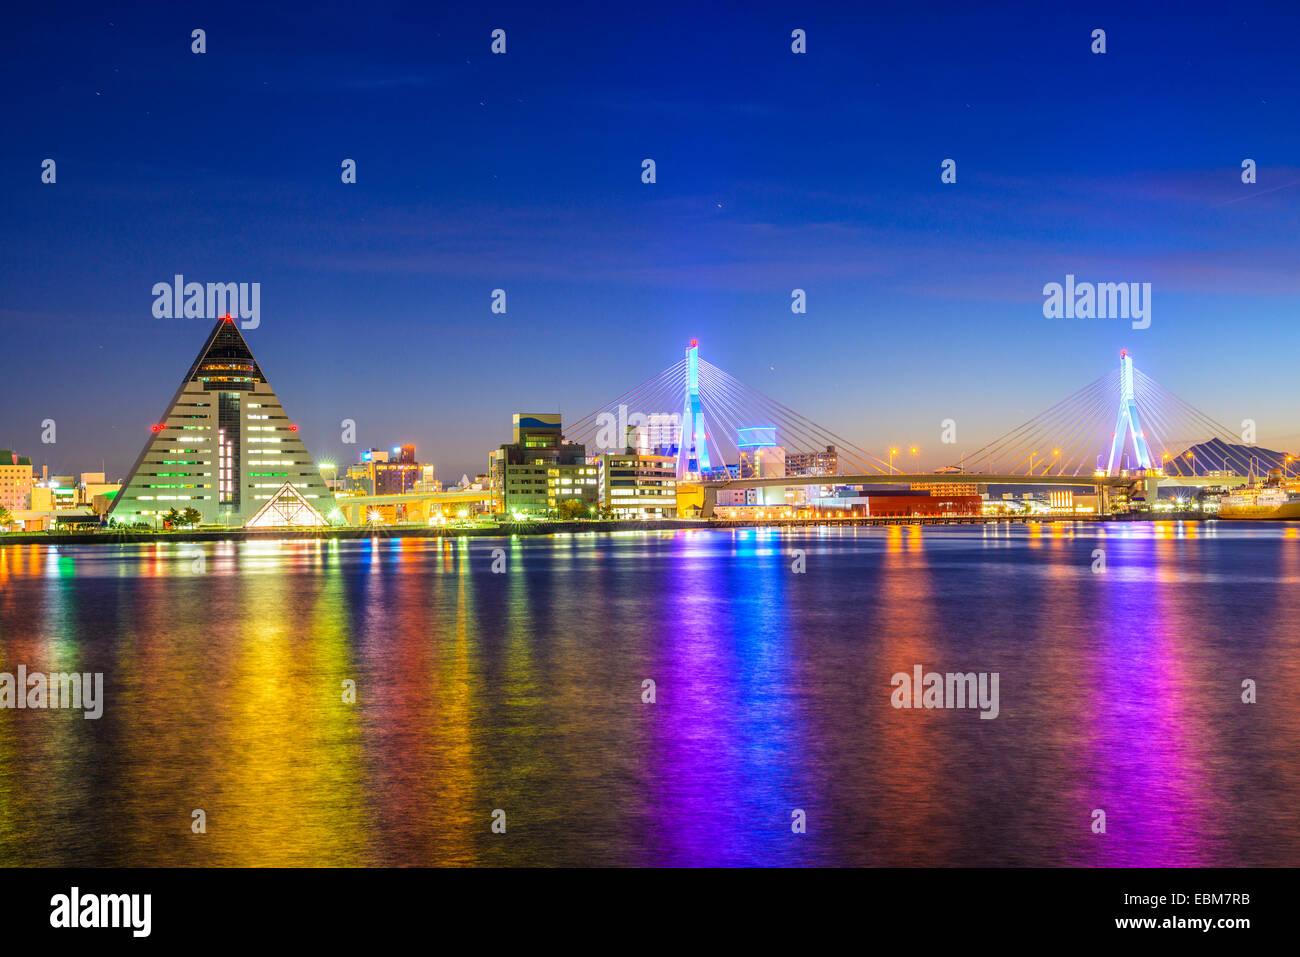 Aomori City, Aomori Prefecture, Japan night skyline. Stock Photo